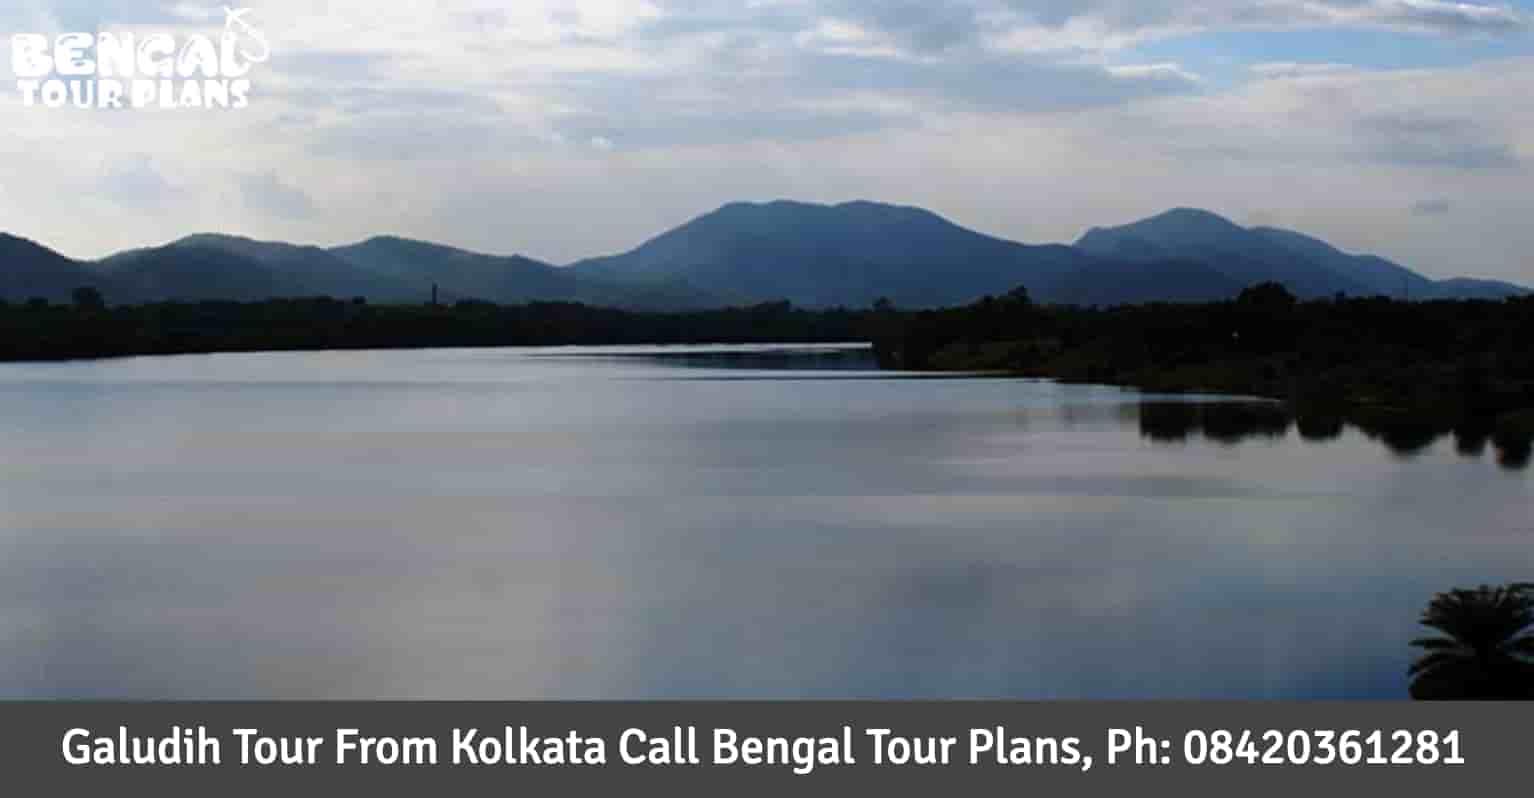 Galudih Tour Package From Kolkata